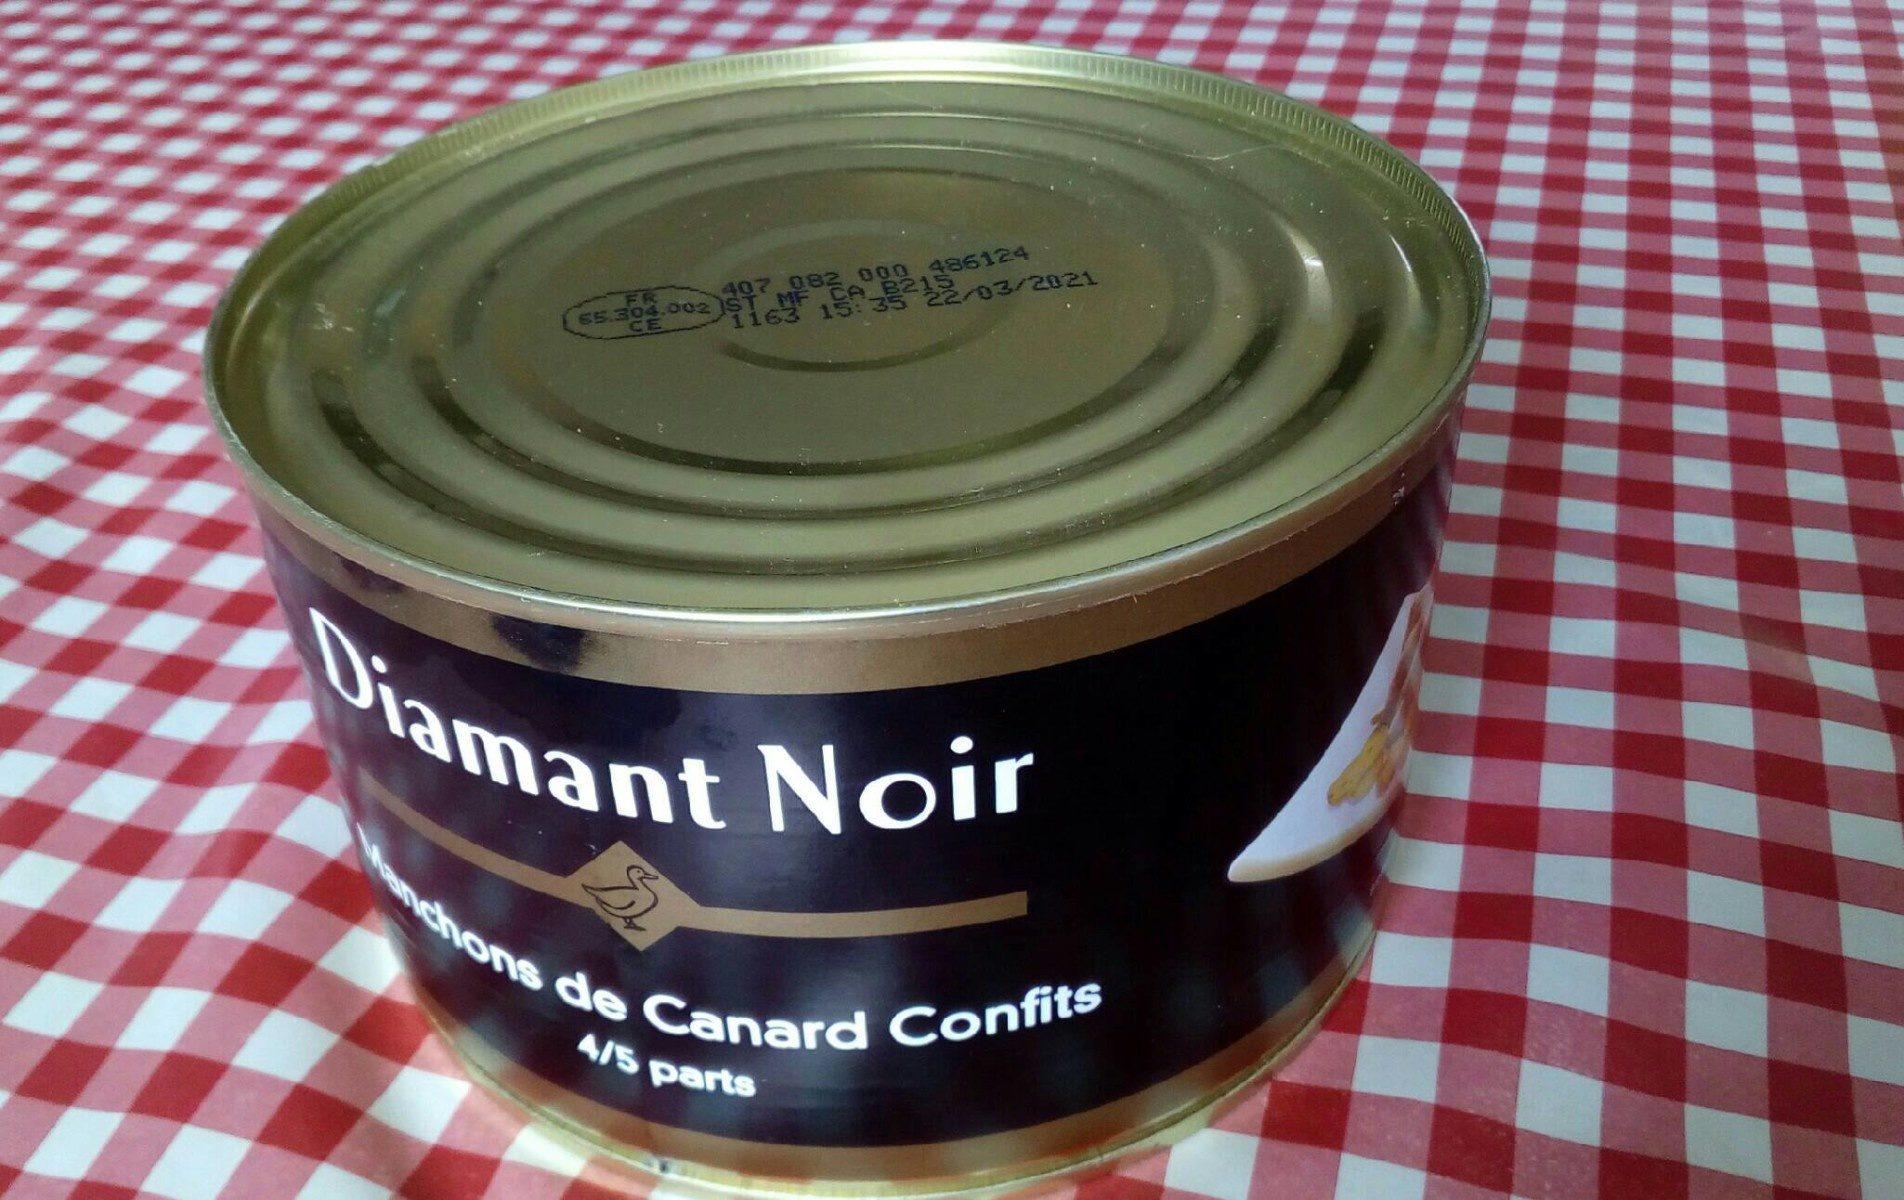 Manchons de canard confits - Product - fr